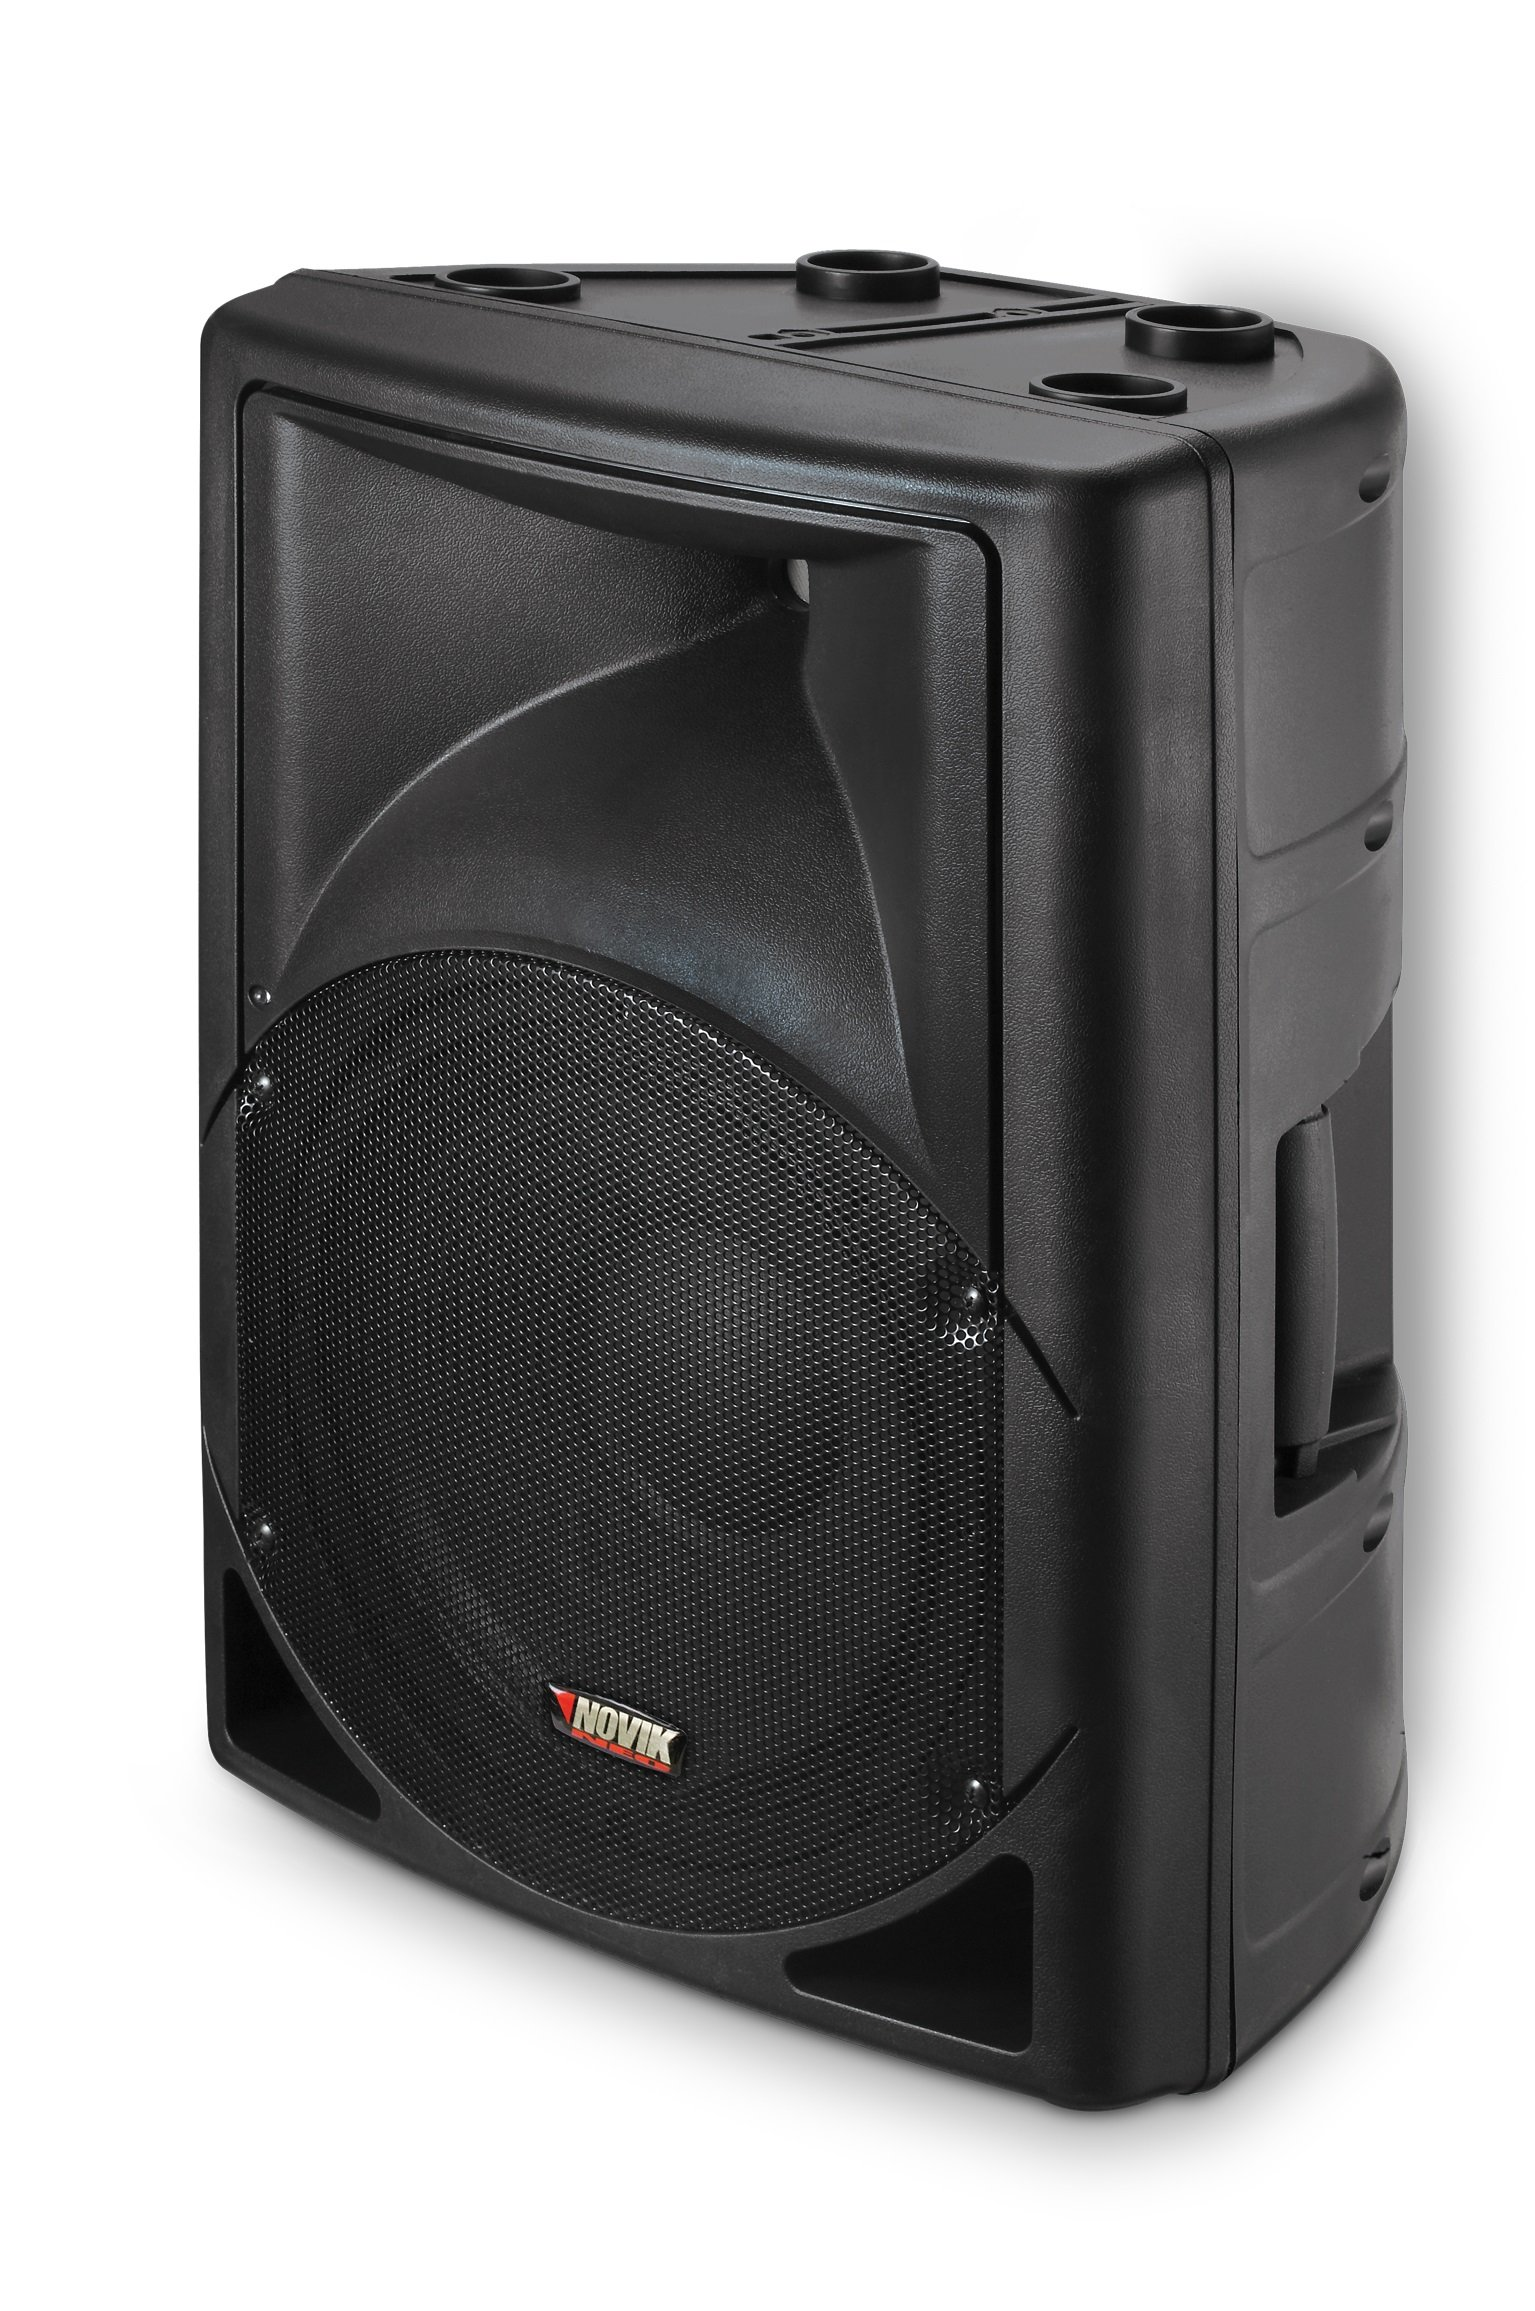 NOVIK NEO EVO 150A USB 2 way Powered Speaker System, Bluetooth, Peak power 600W, Woofer: 10'', 2 channel mixer by NOVIK NEO